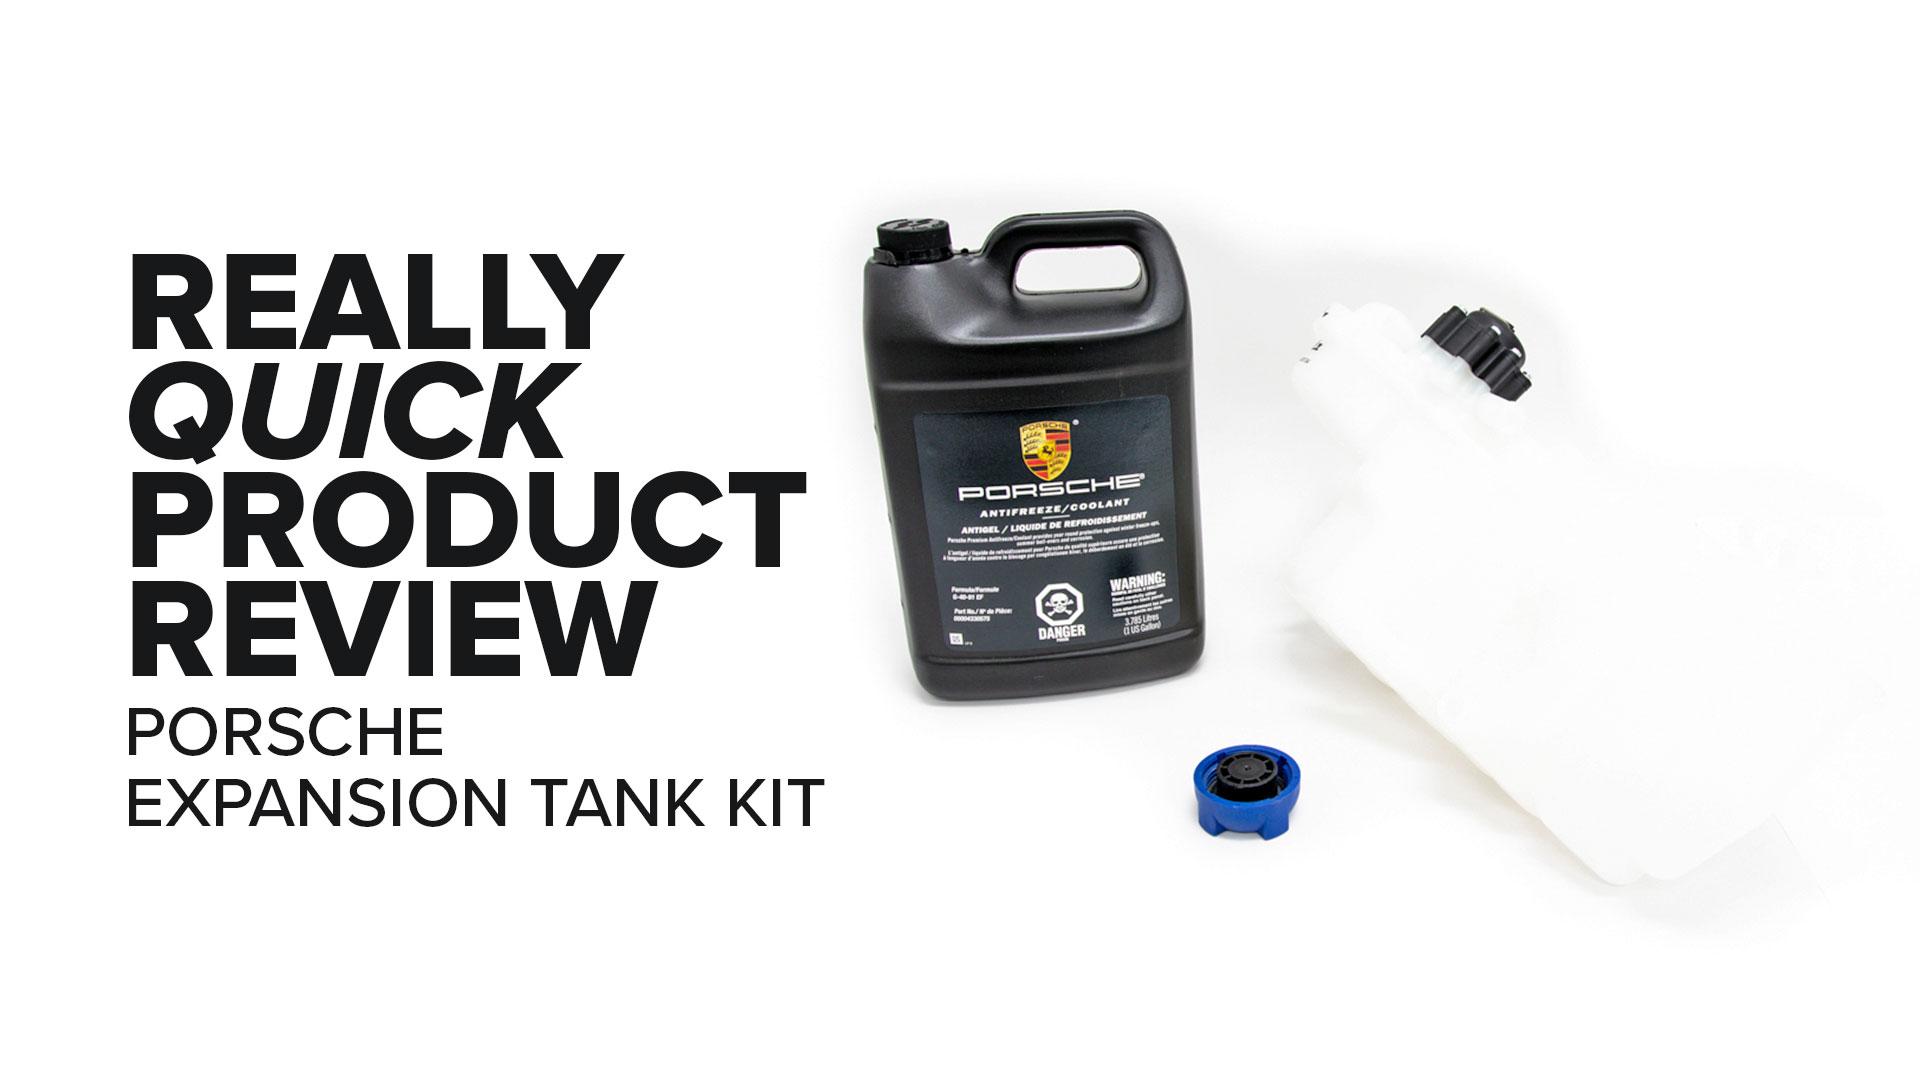 Porsche 996 911 Coolant Expansion Tank Kit - Symptoms And Product Review